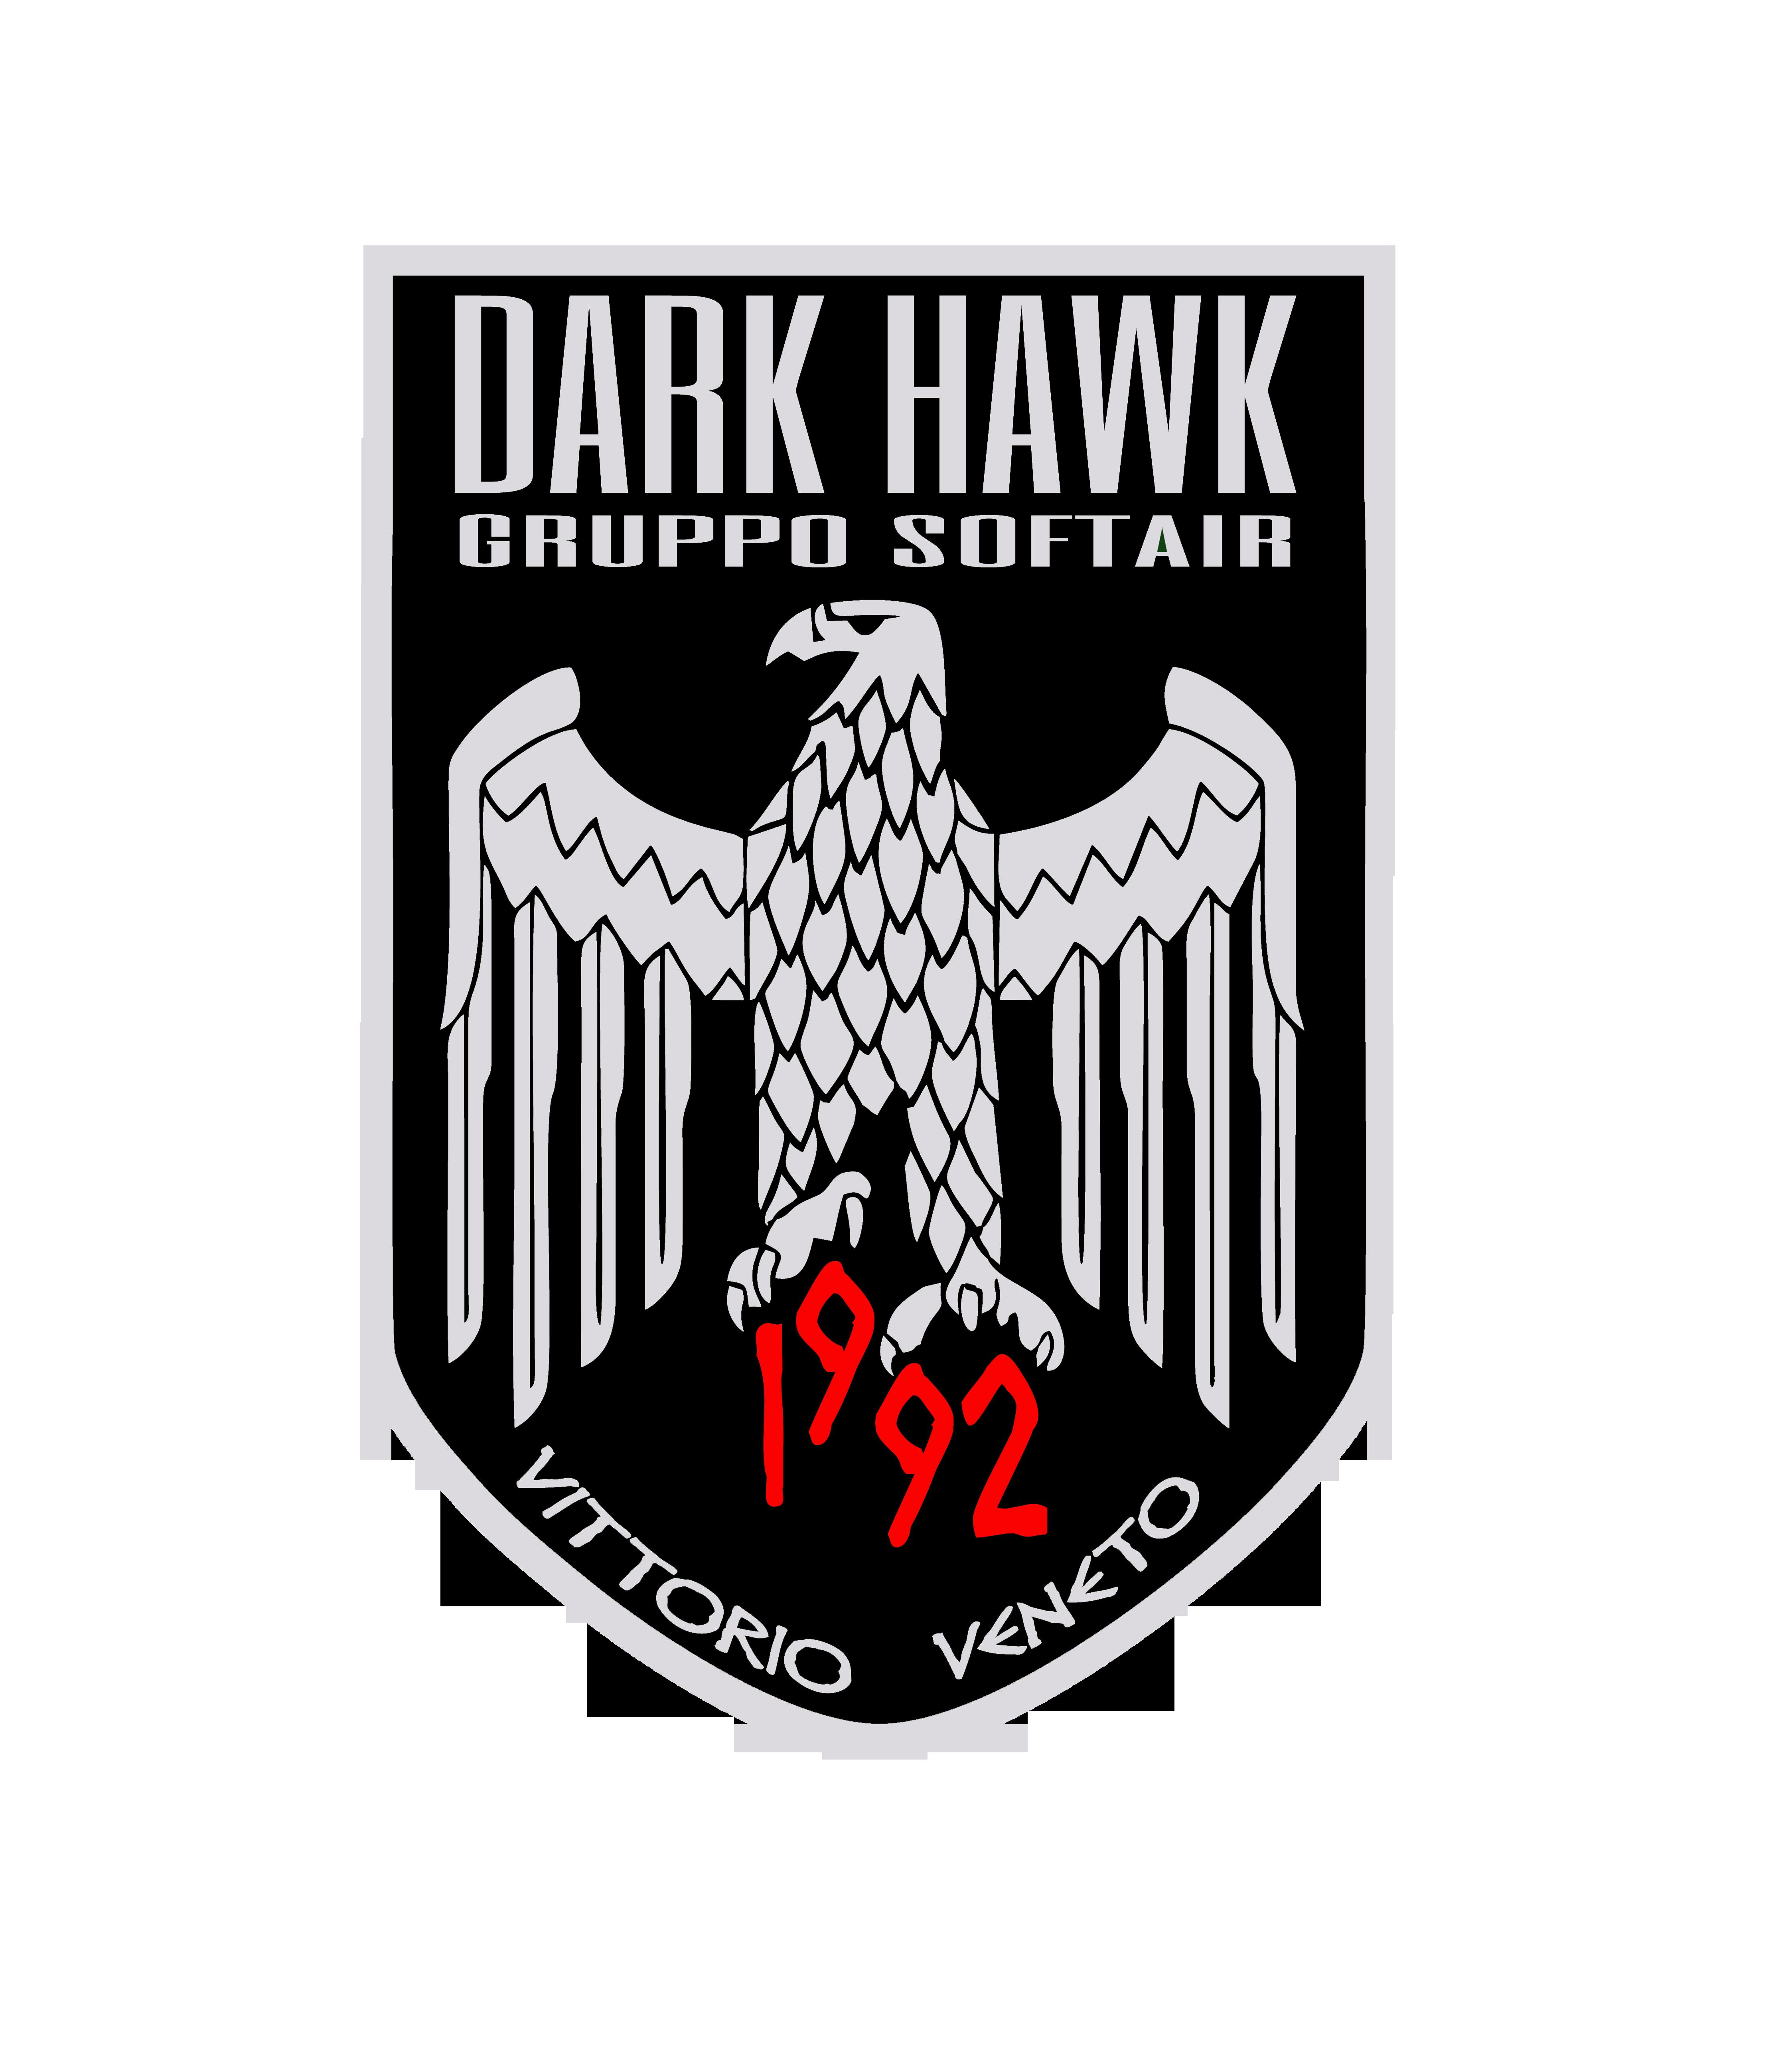 DARK HAWK G.S.A.